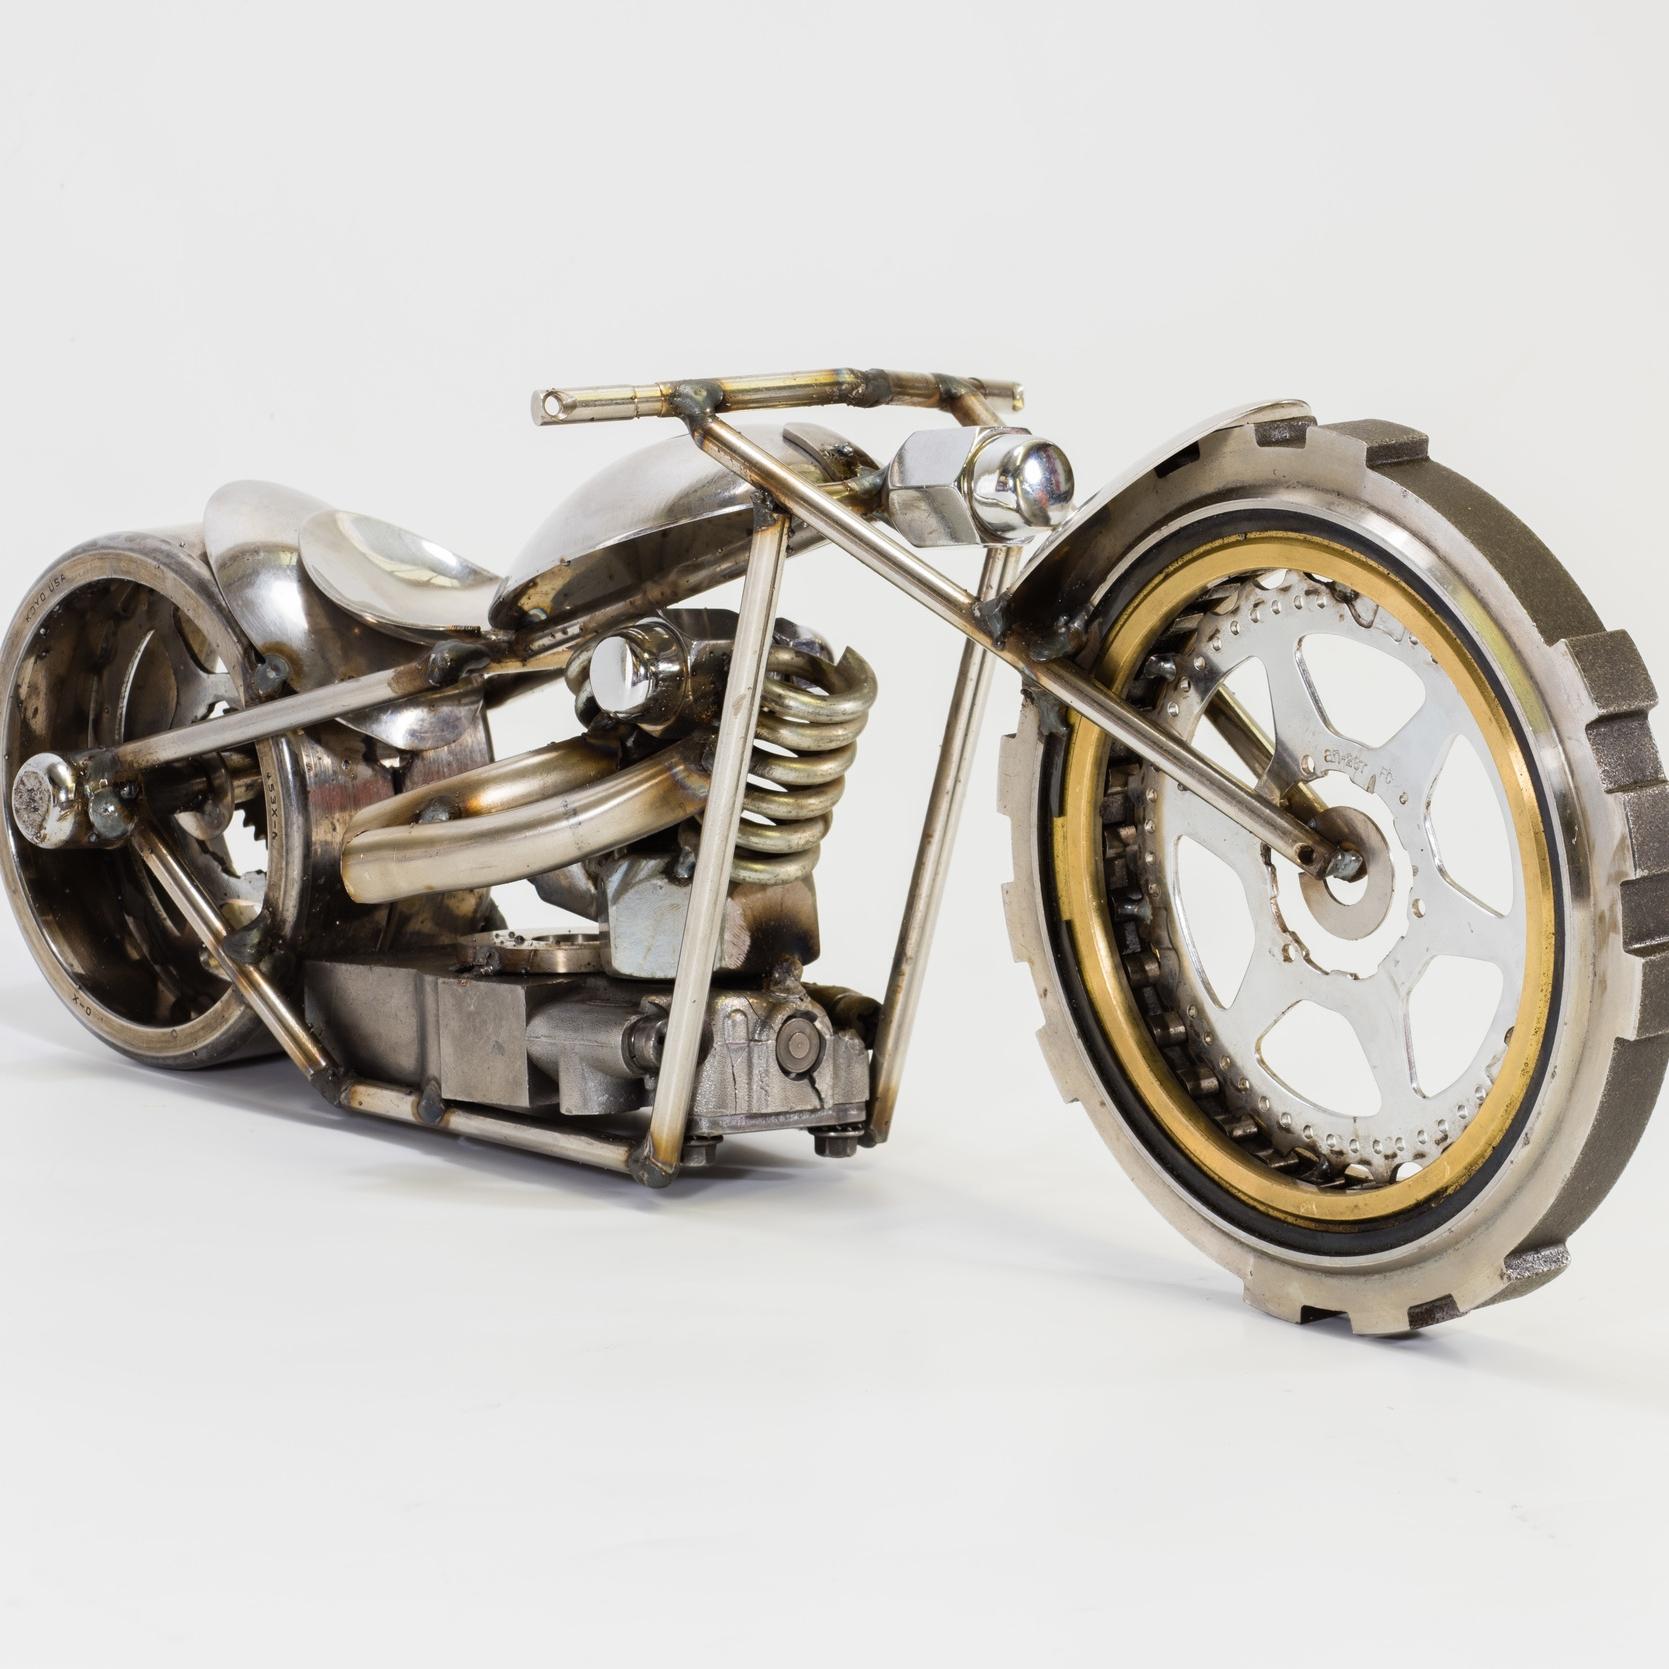 Tim Sprengelmeyer   Midwest Recycled Art